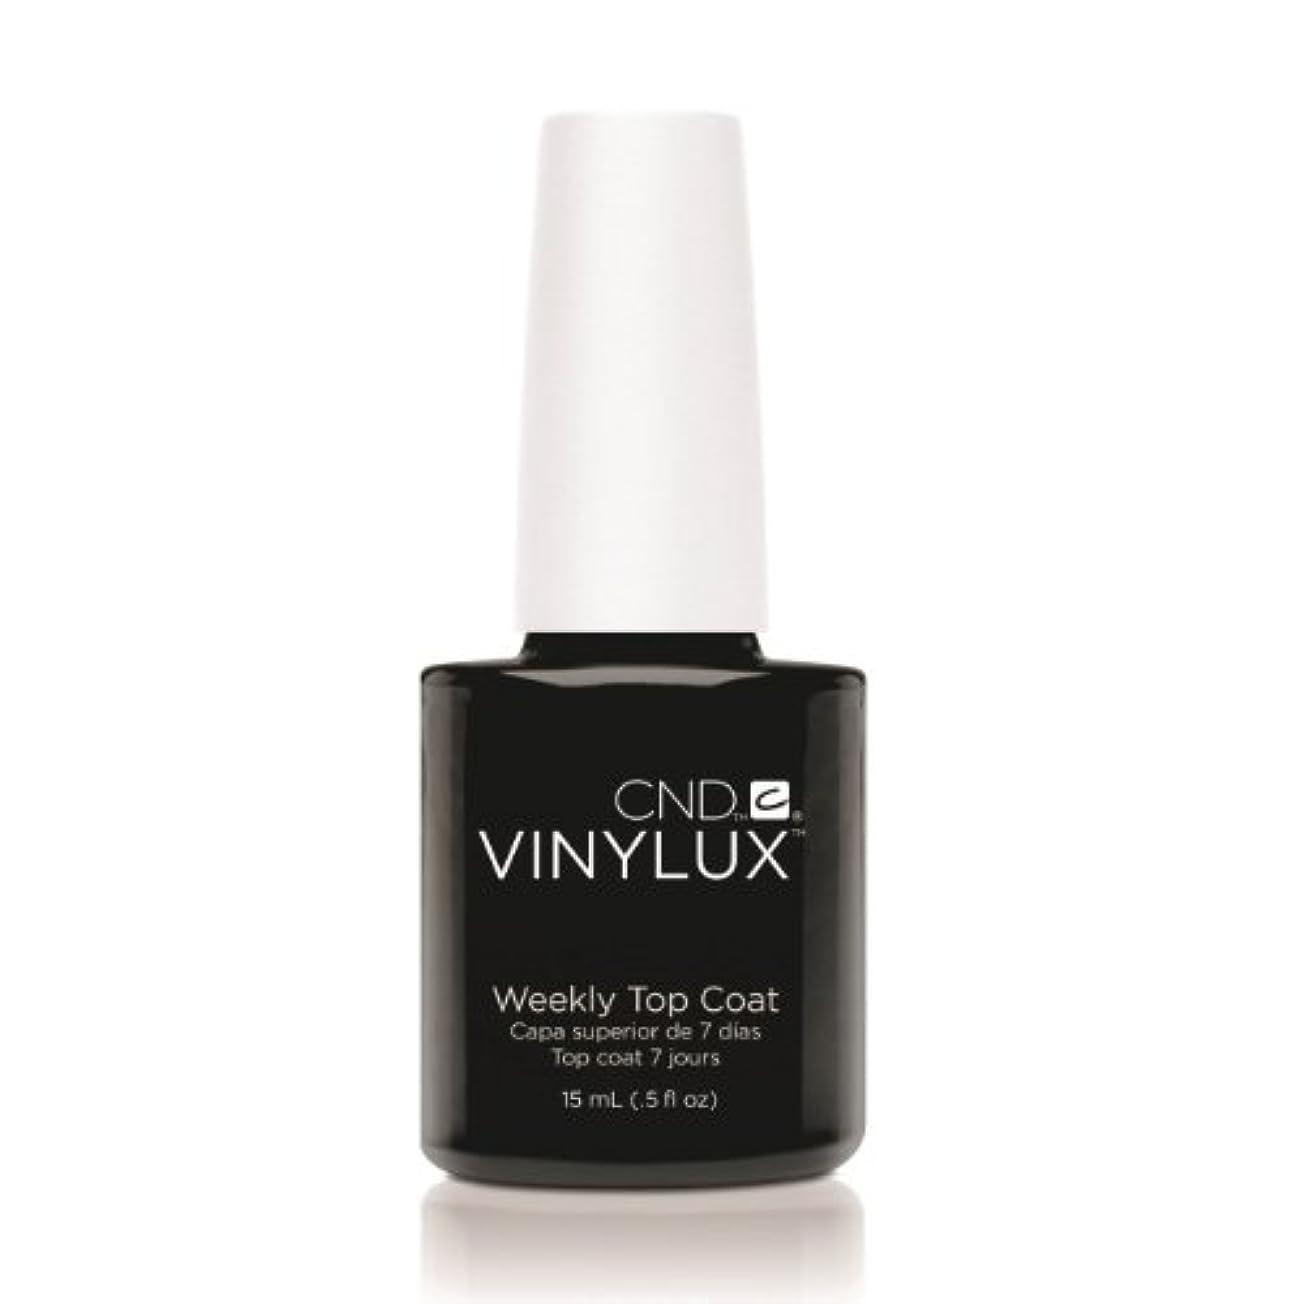 CND VINYLUX Weekly Top Coat - Clear (並行輸入品)